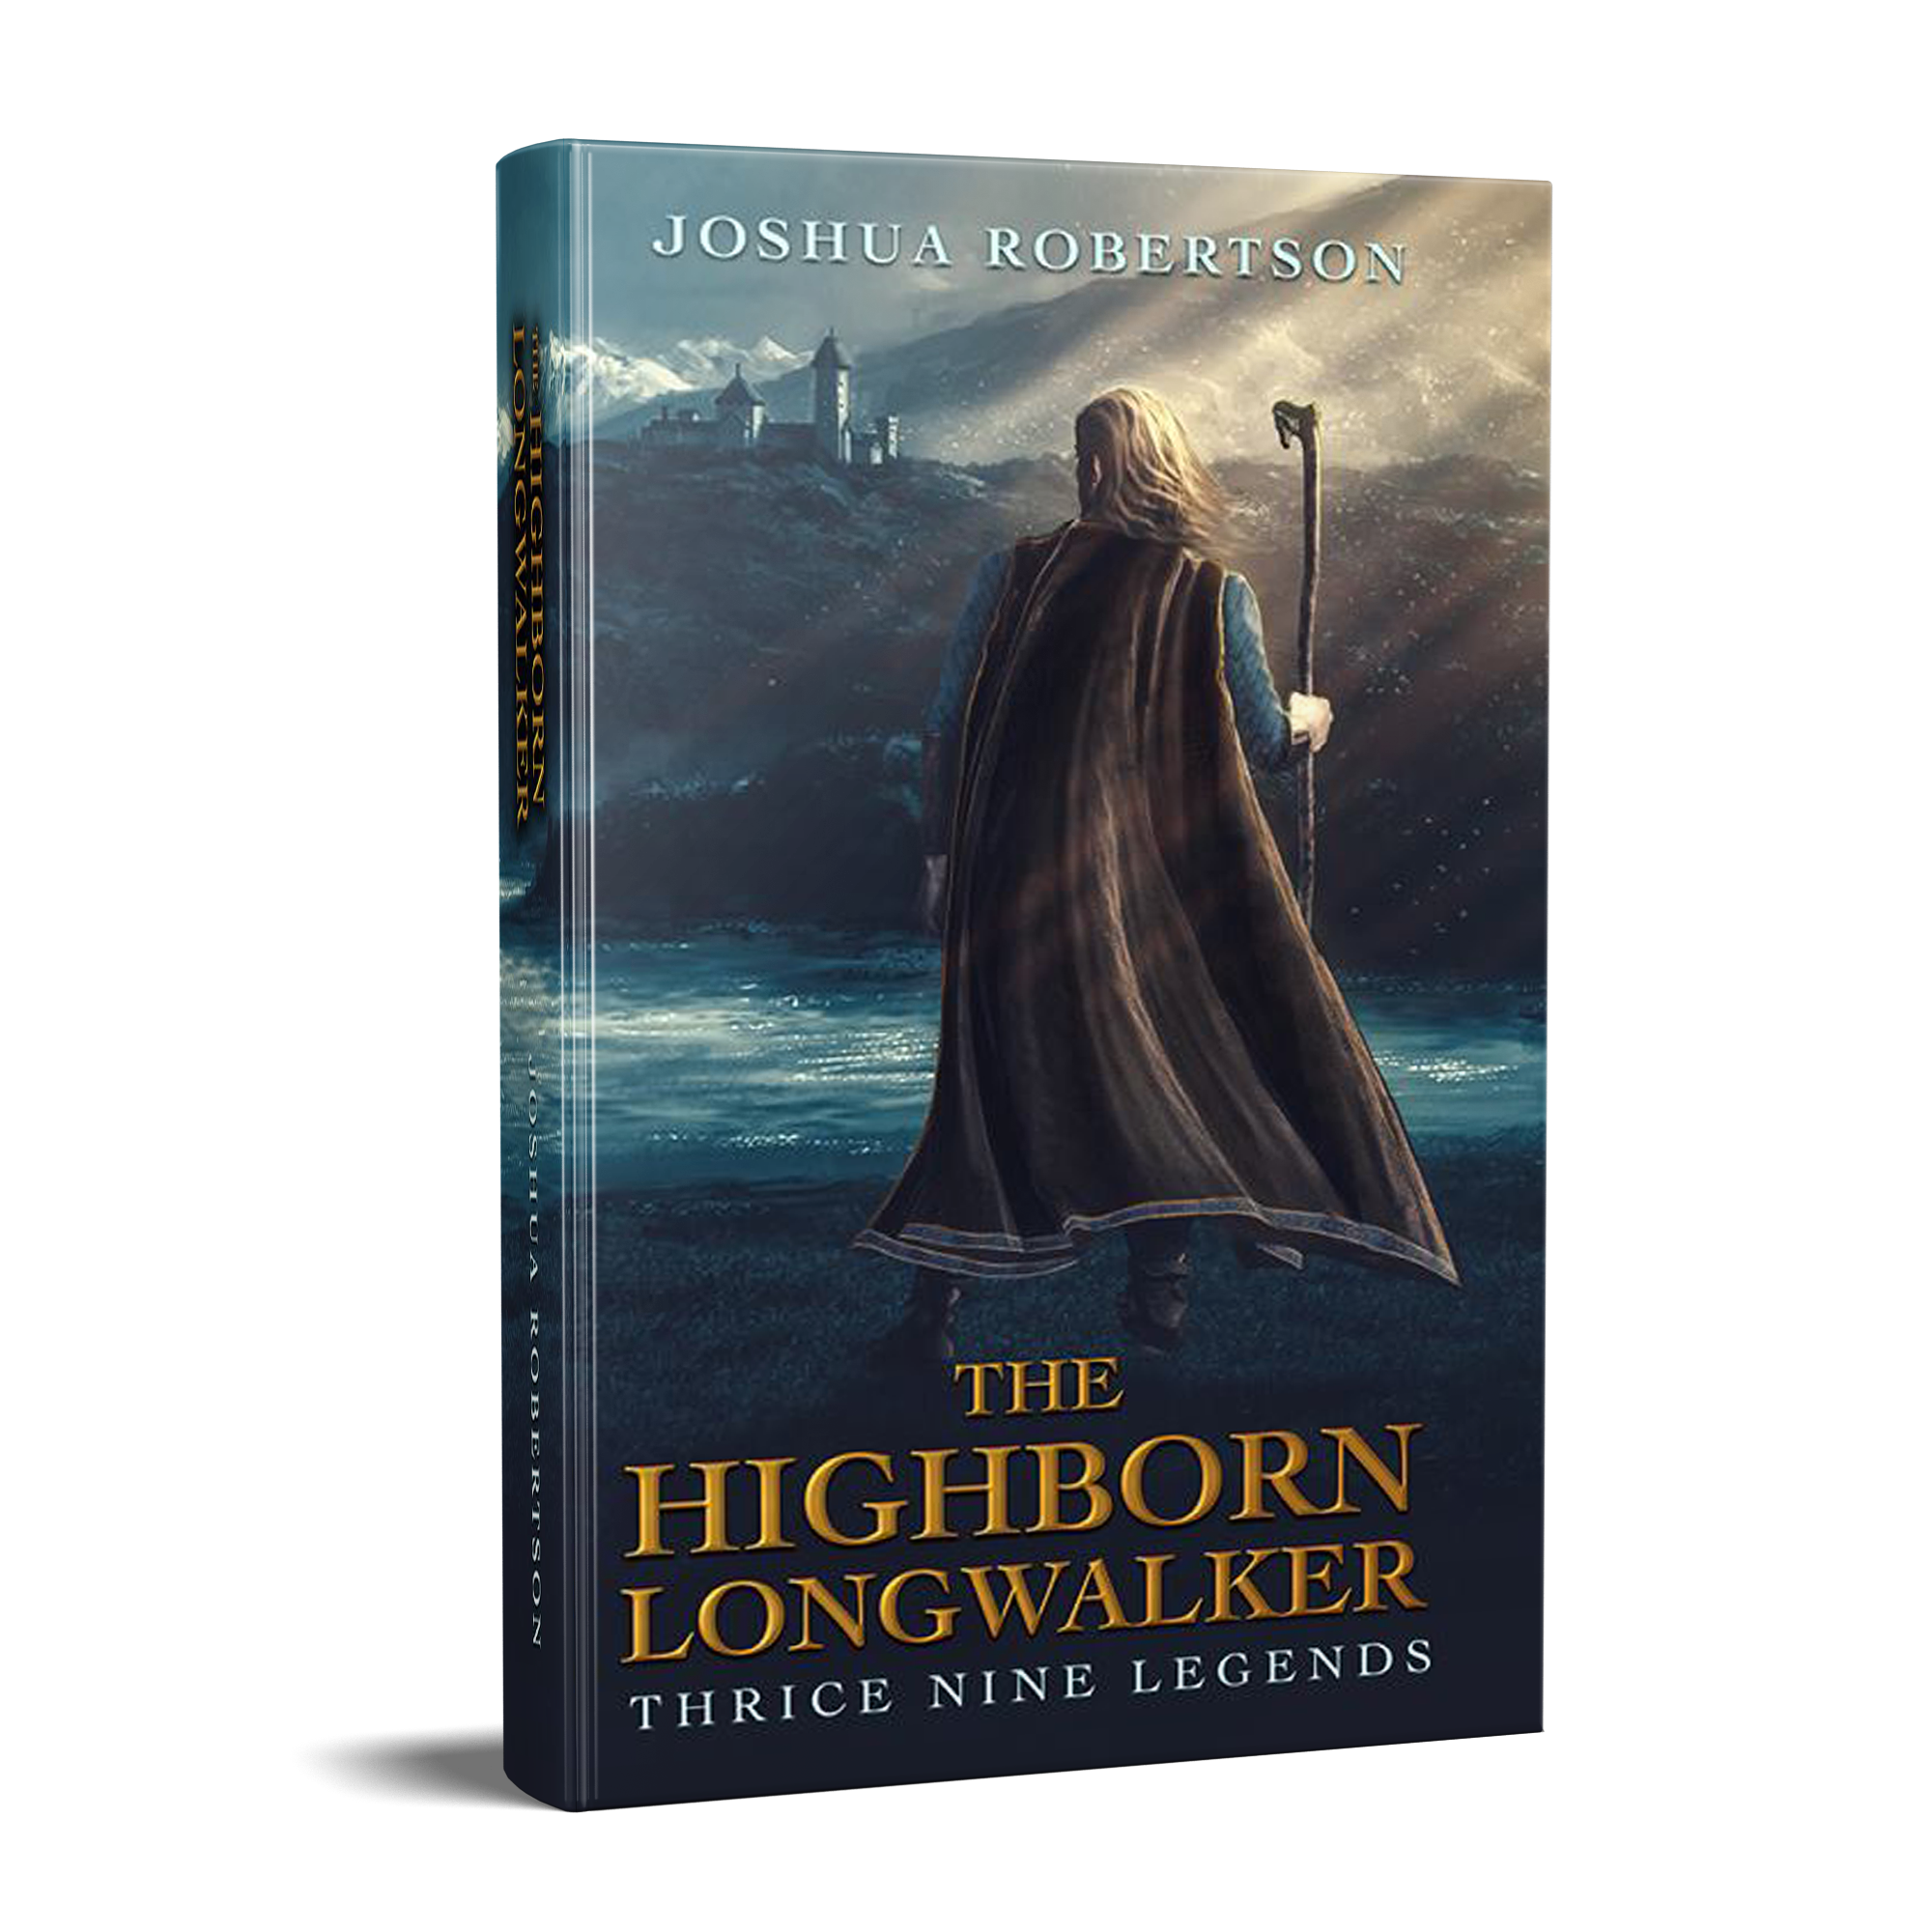 The Highborn Longwalker - Hardback 00008